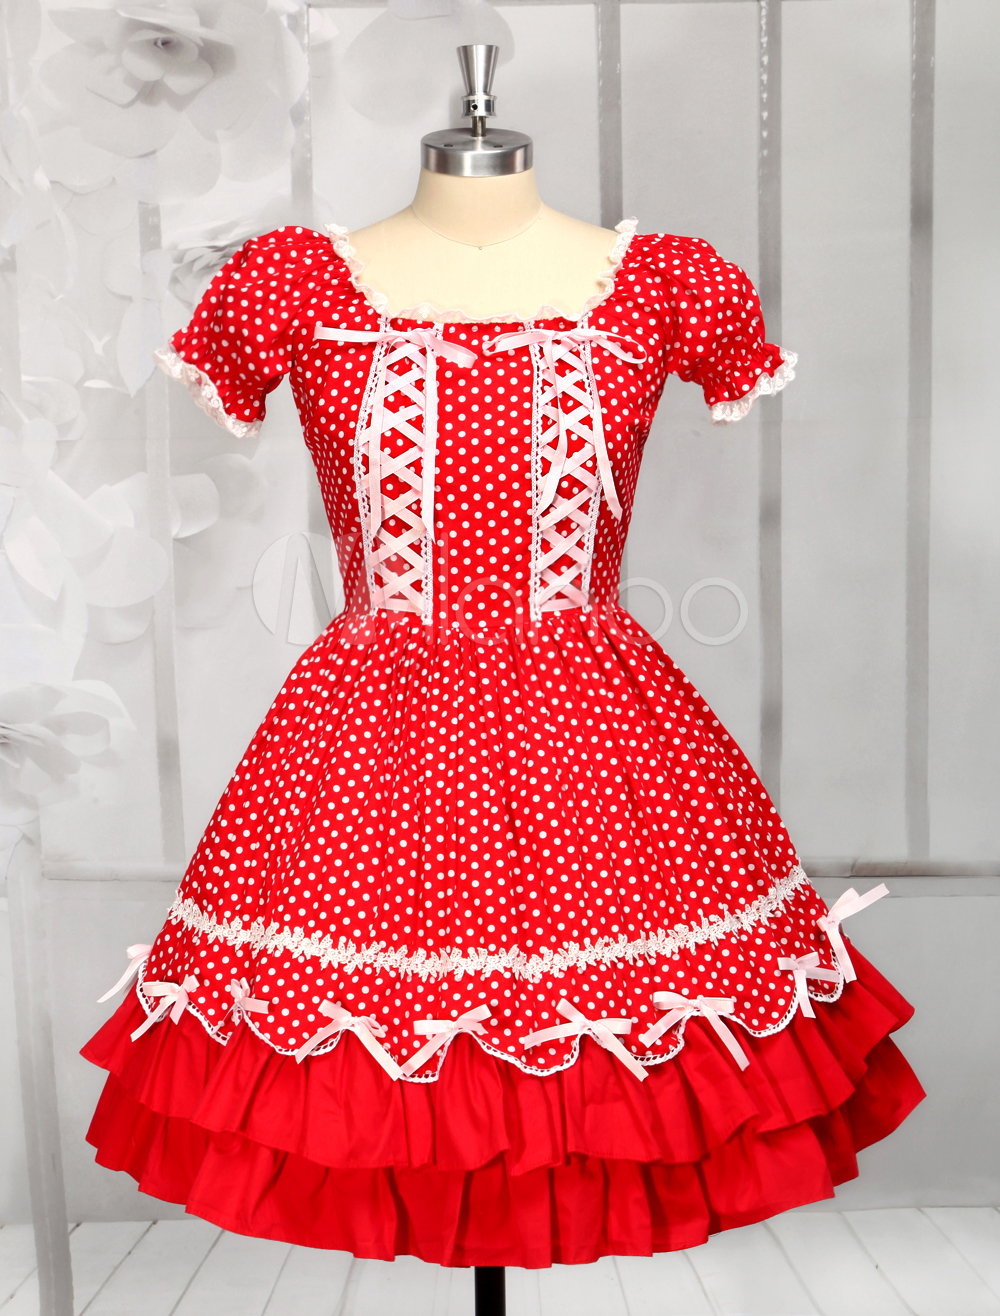 Red Cotton Short Sleeves Square Neck Drawstring Lolita Dress (Costumes) photo